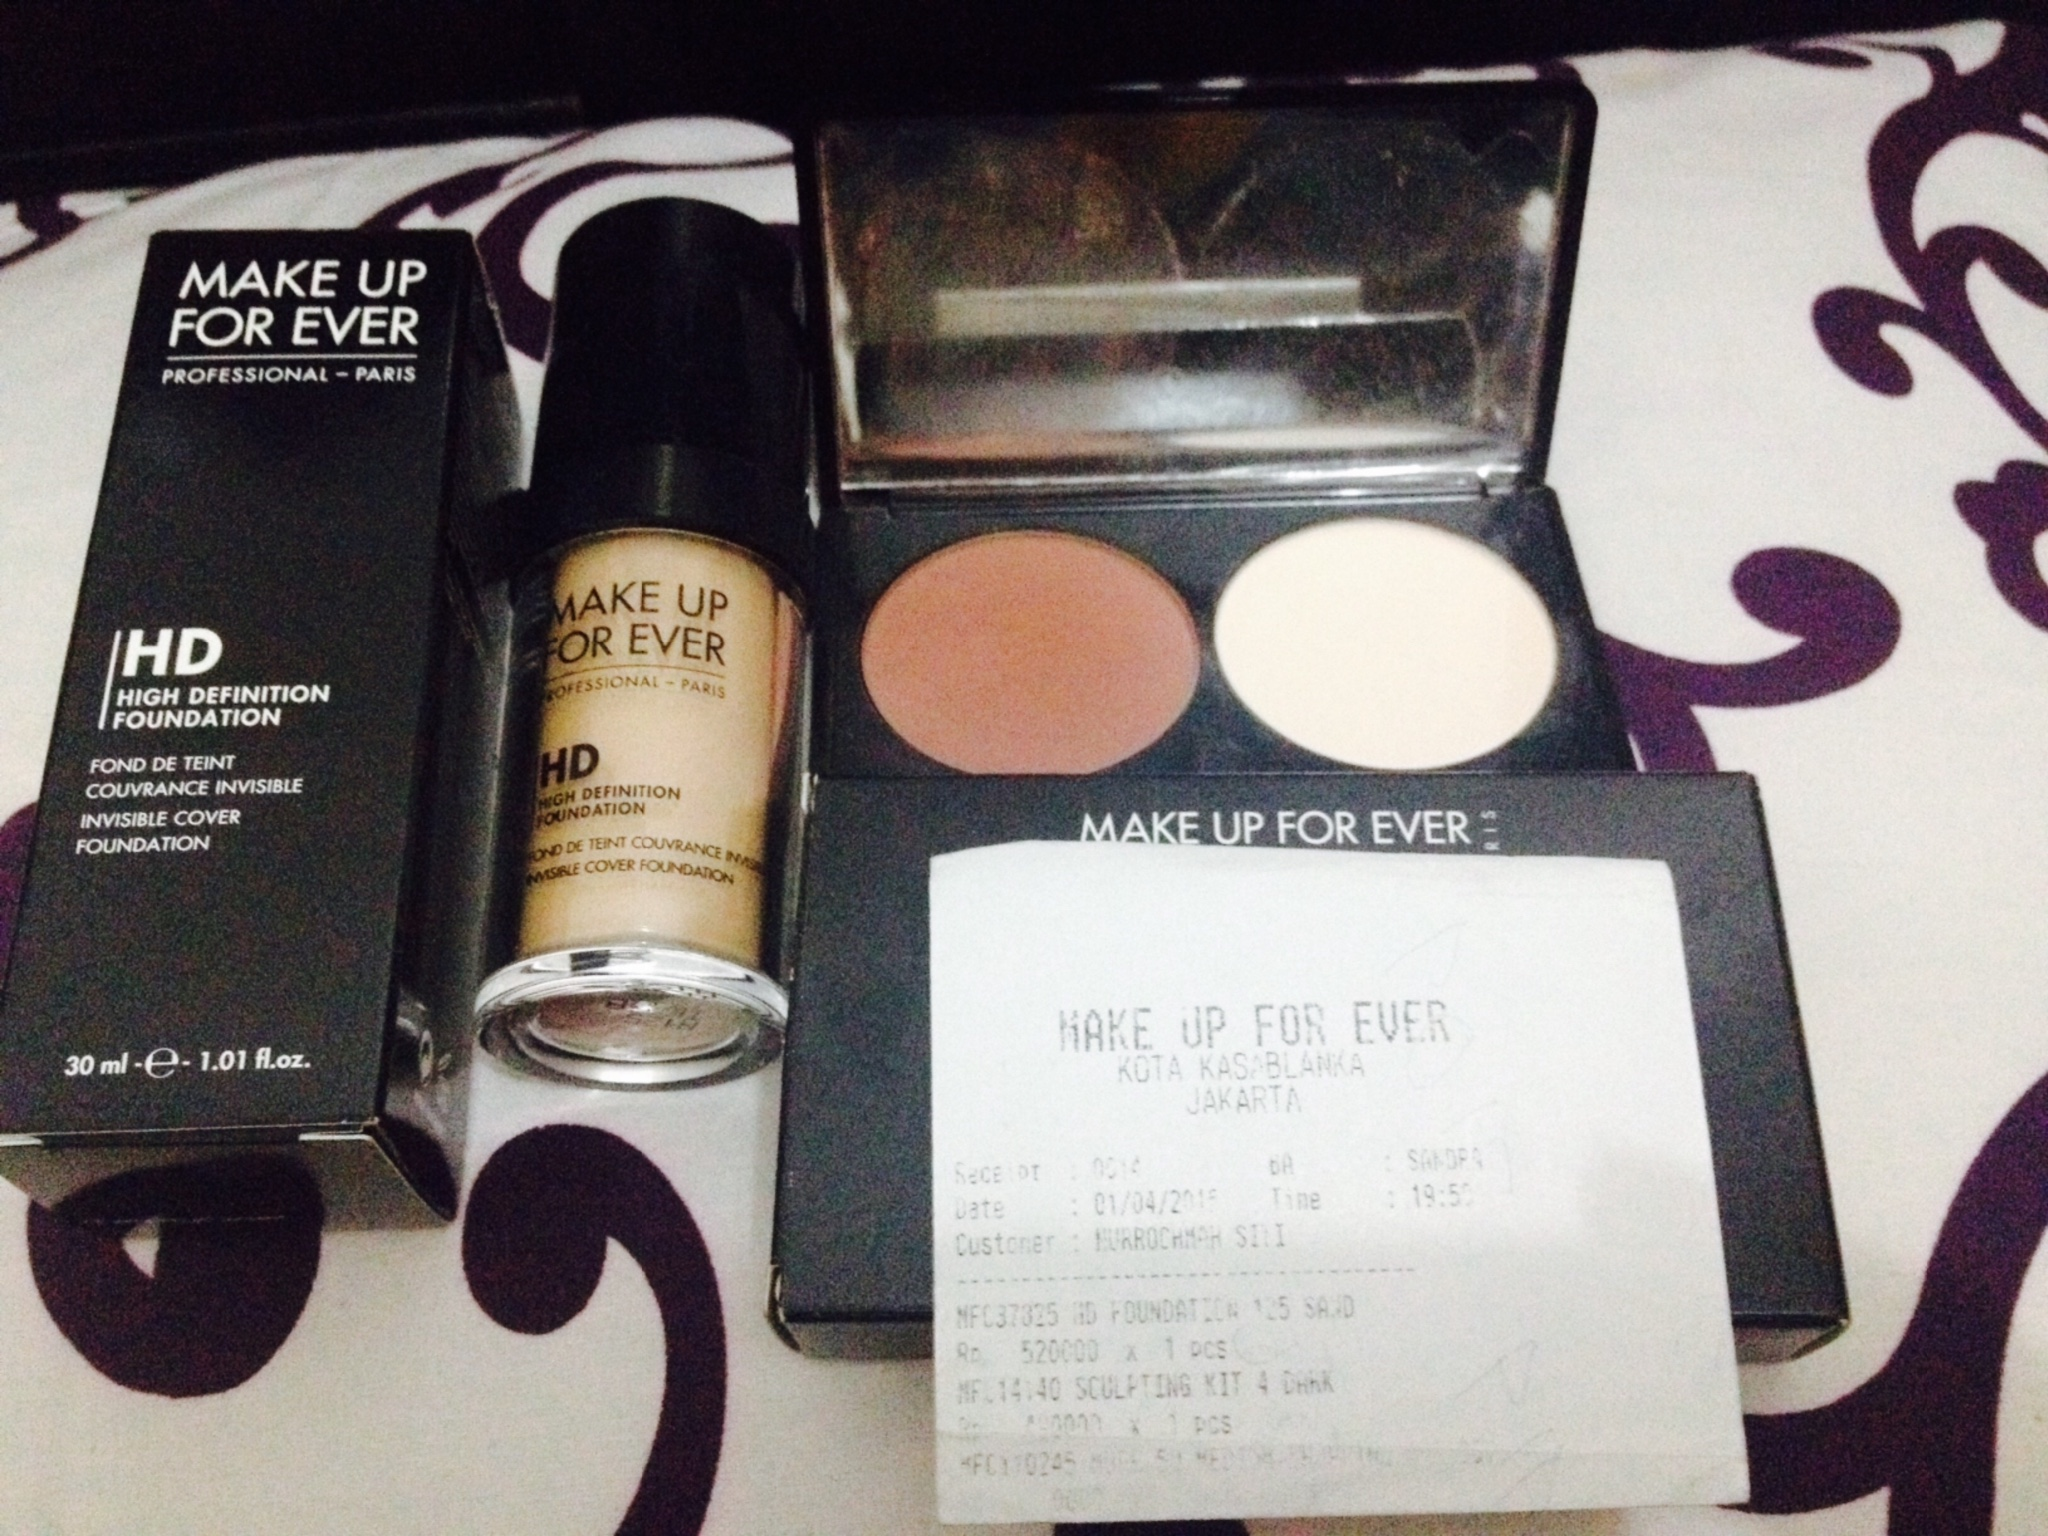 Makeup forever hd foundation samples